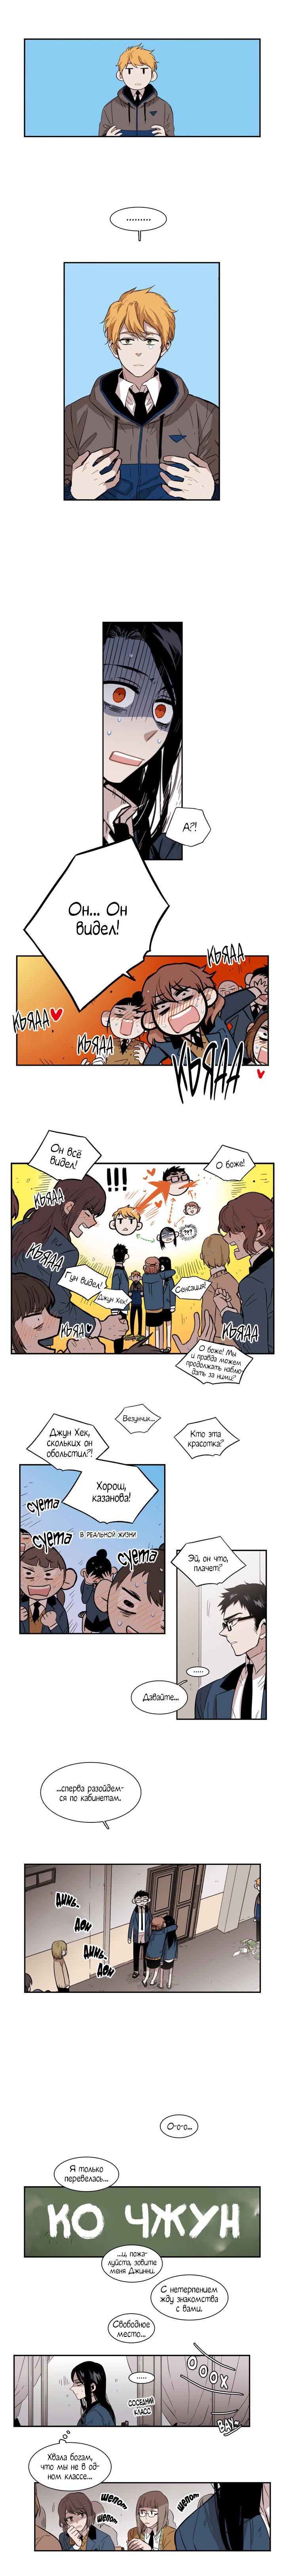 https://r1.ninemanga.com/comics/pic2/24/19800/344189/1511987734294.jpg Page 5